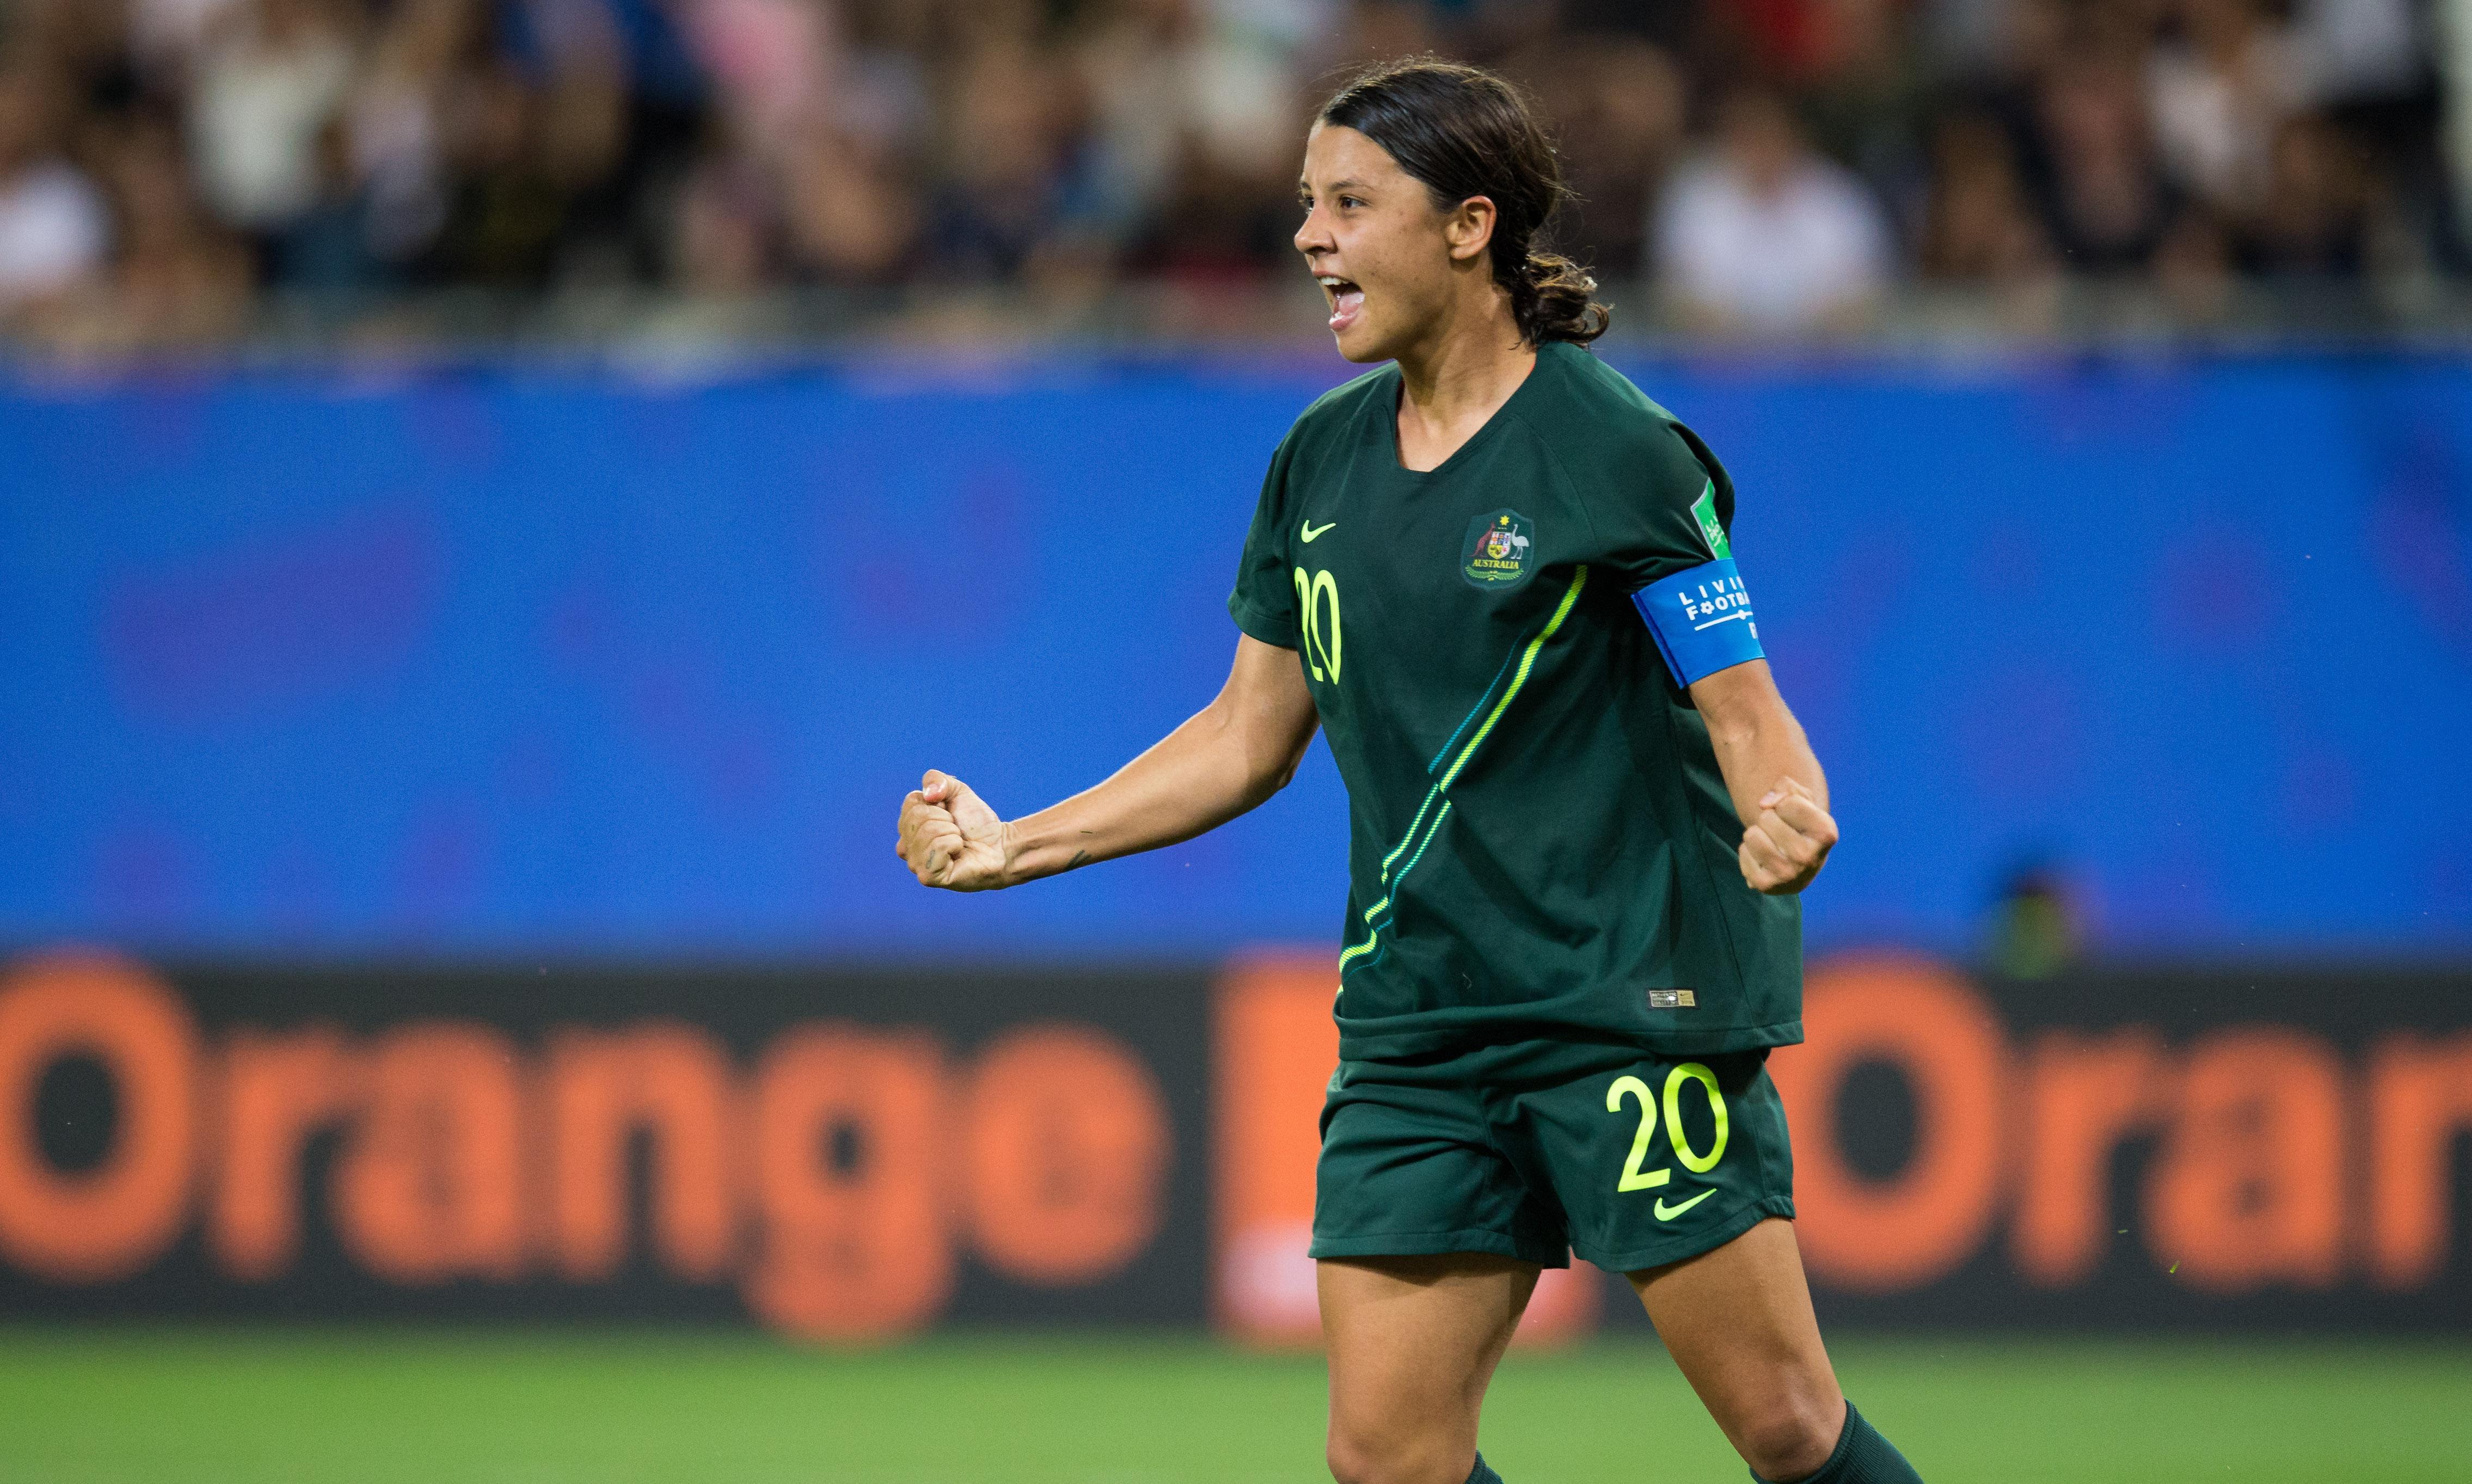 Jamaica 1-4 Australia: Women's World Cup player ratings